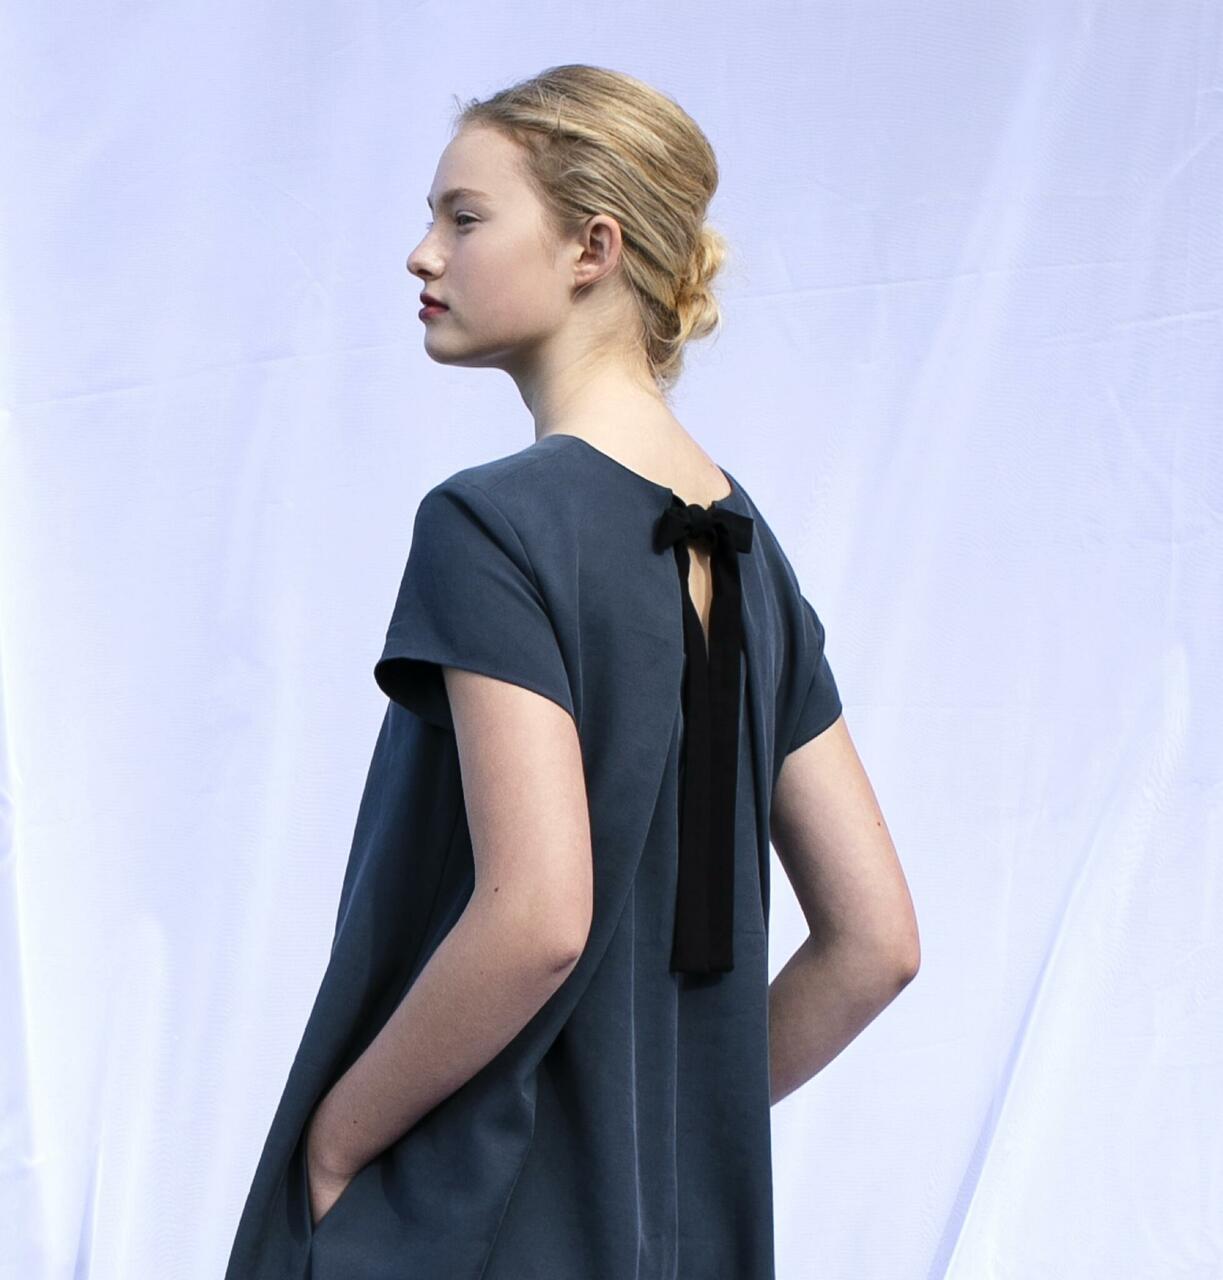 Kahevärviline kleit 168€